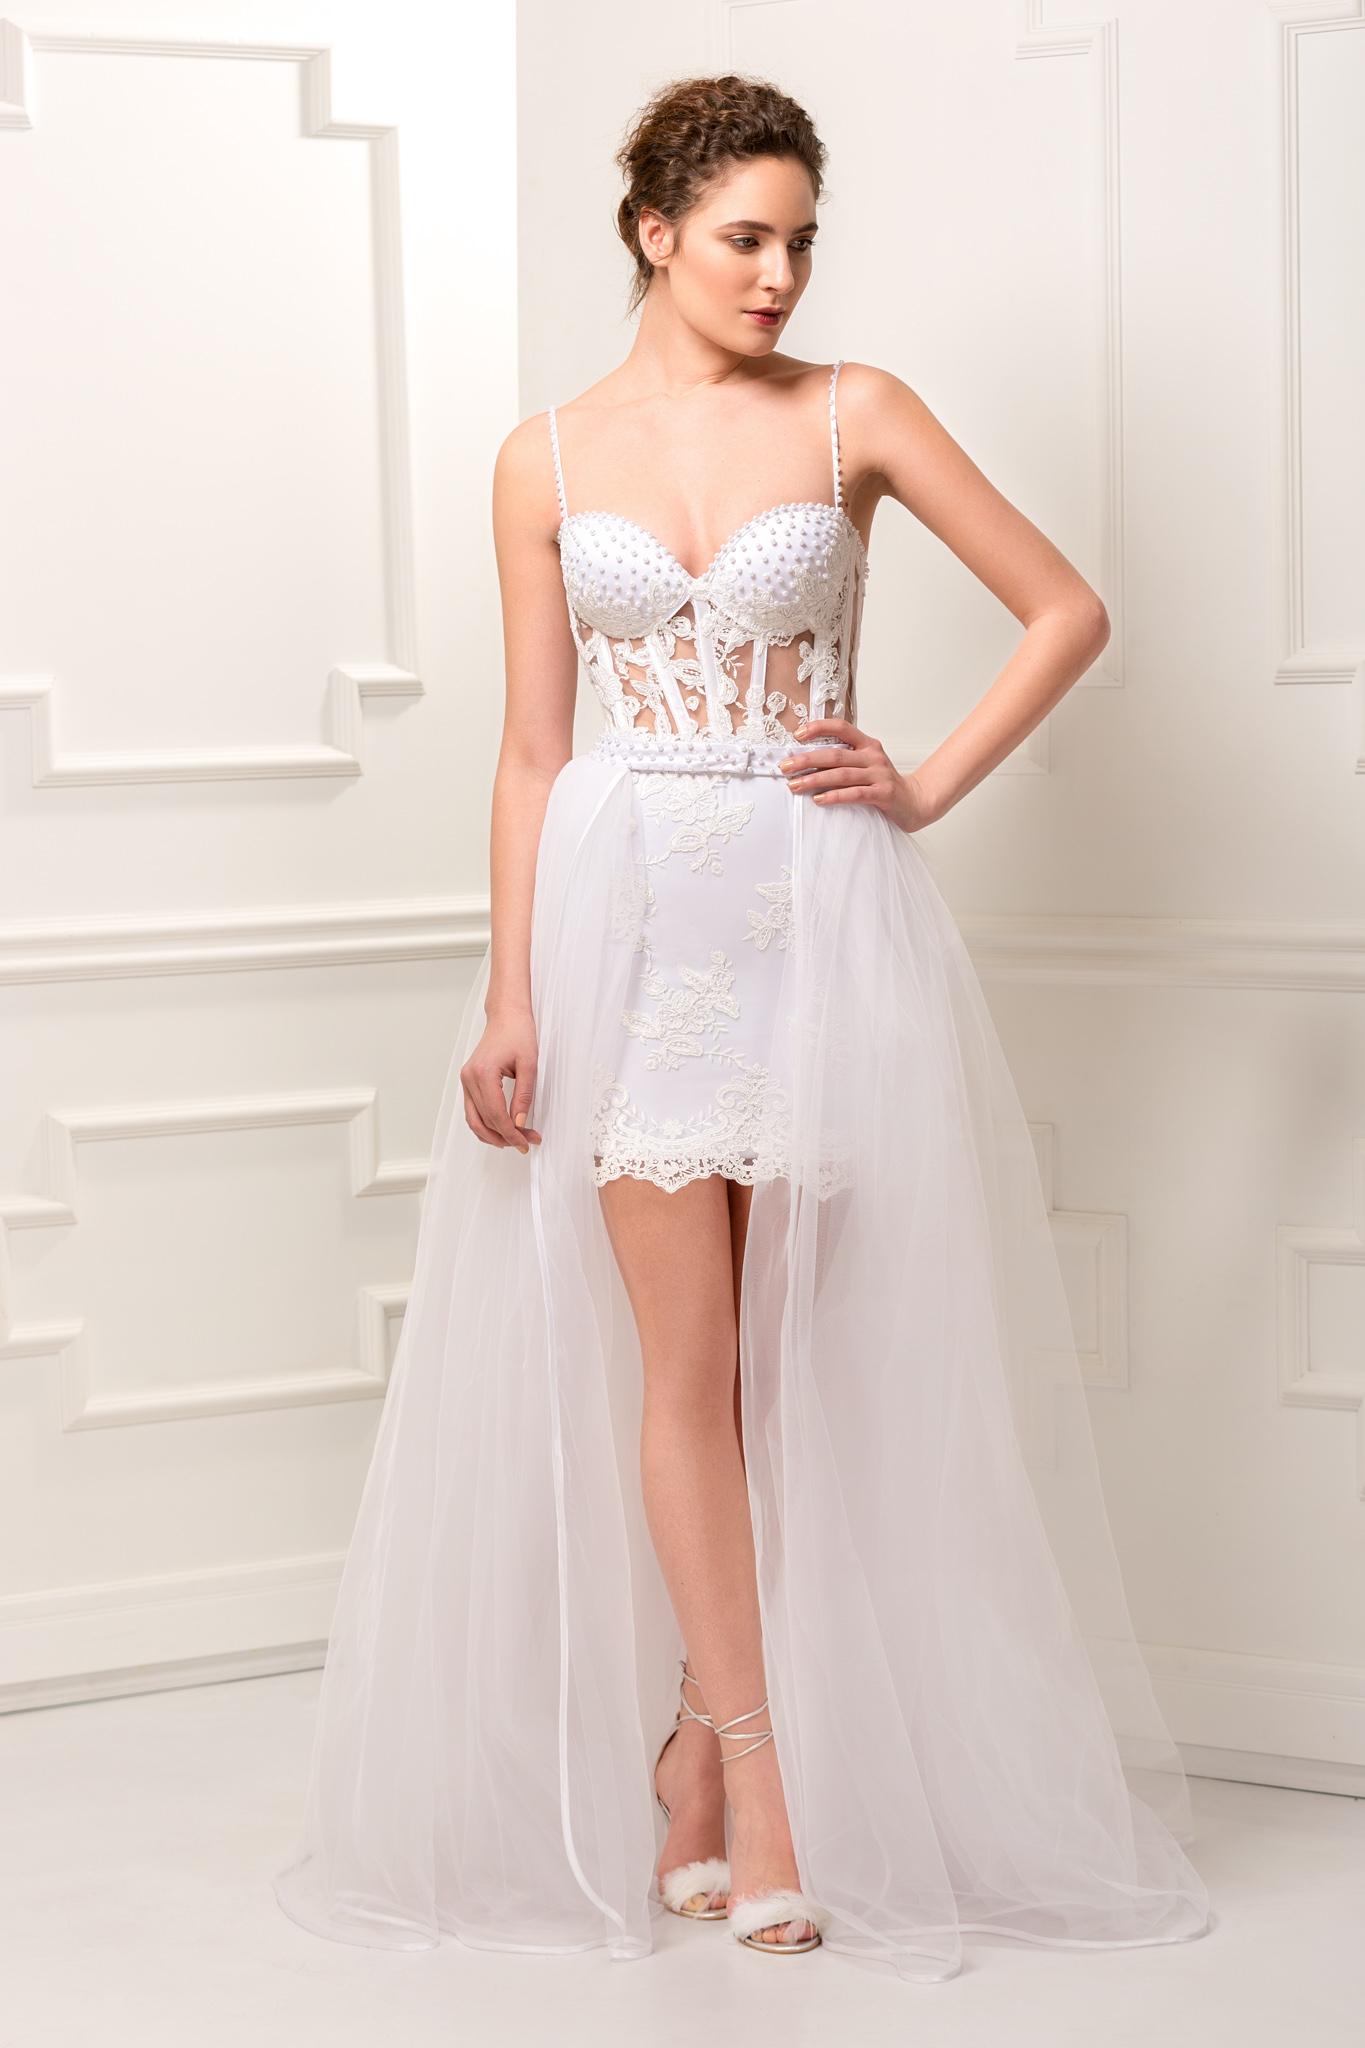 Short Lace Wedding Dress.Short Lace Wedding Dress With Tulle Train Aida Lorena Atelier